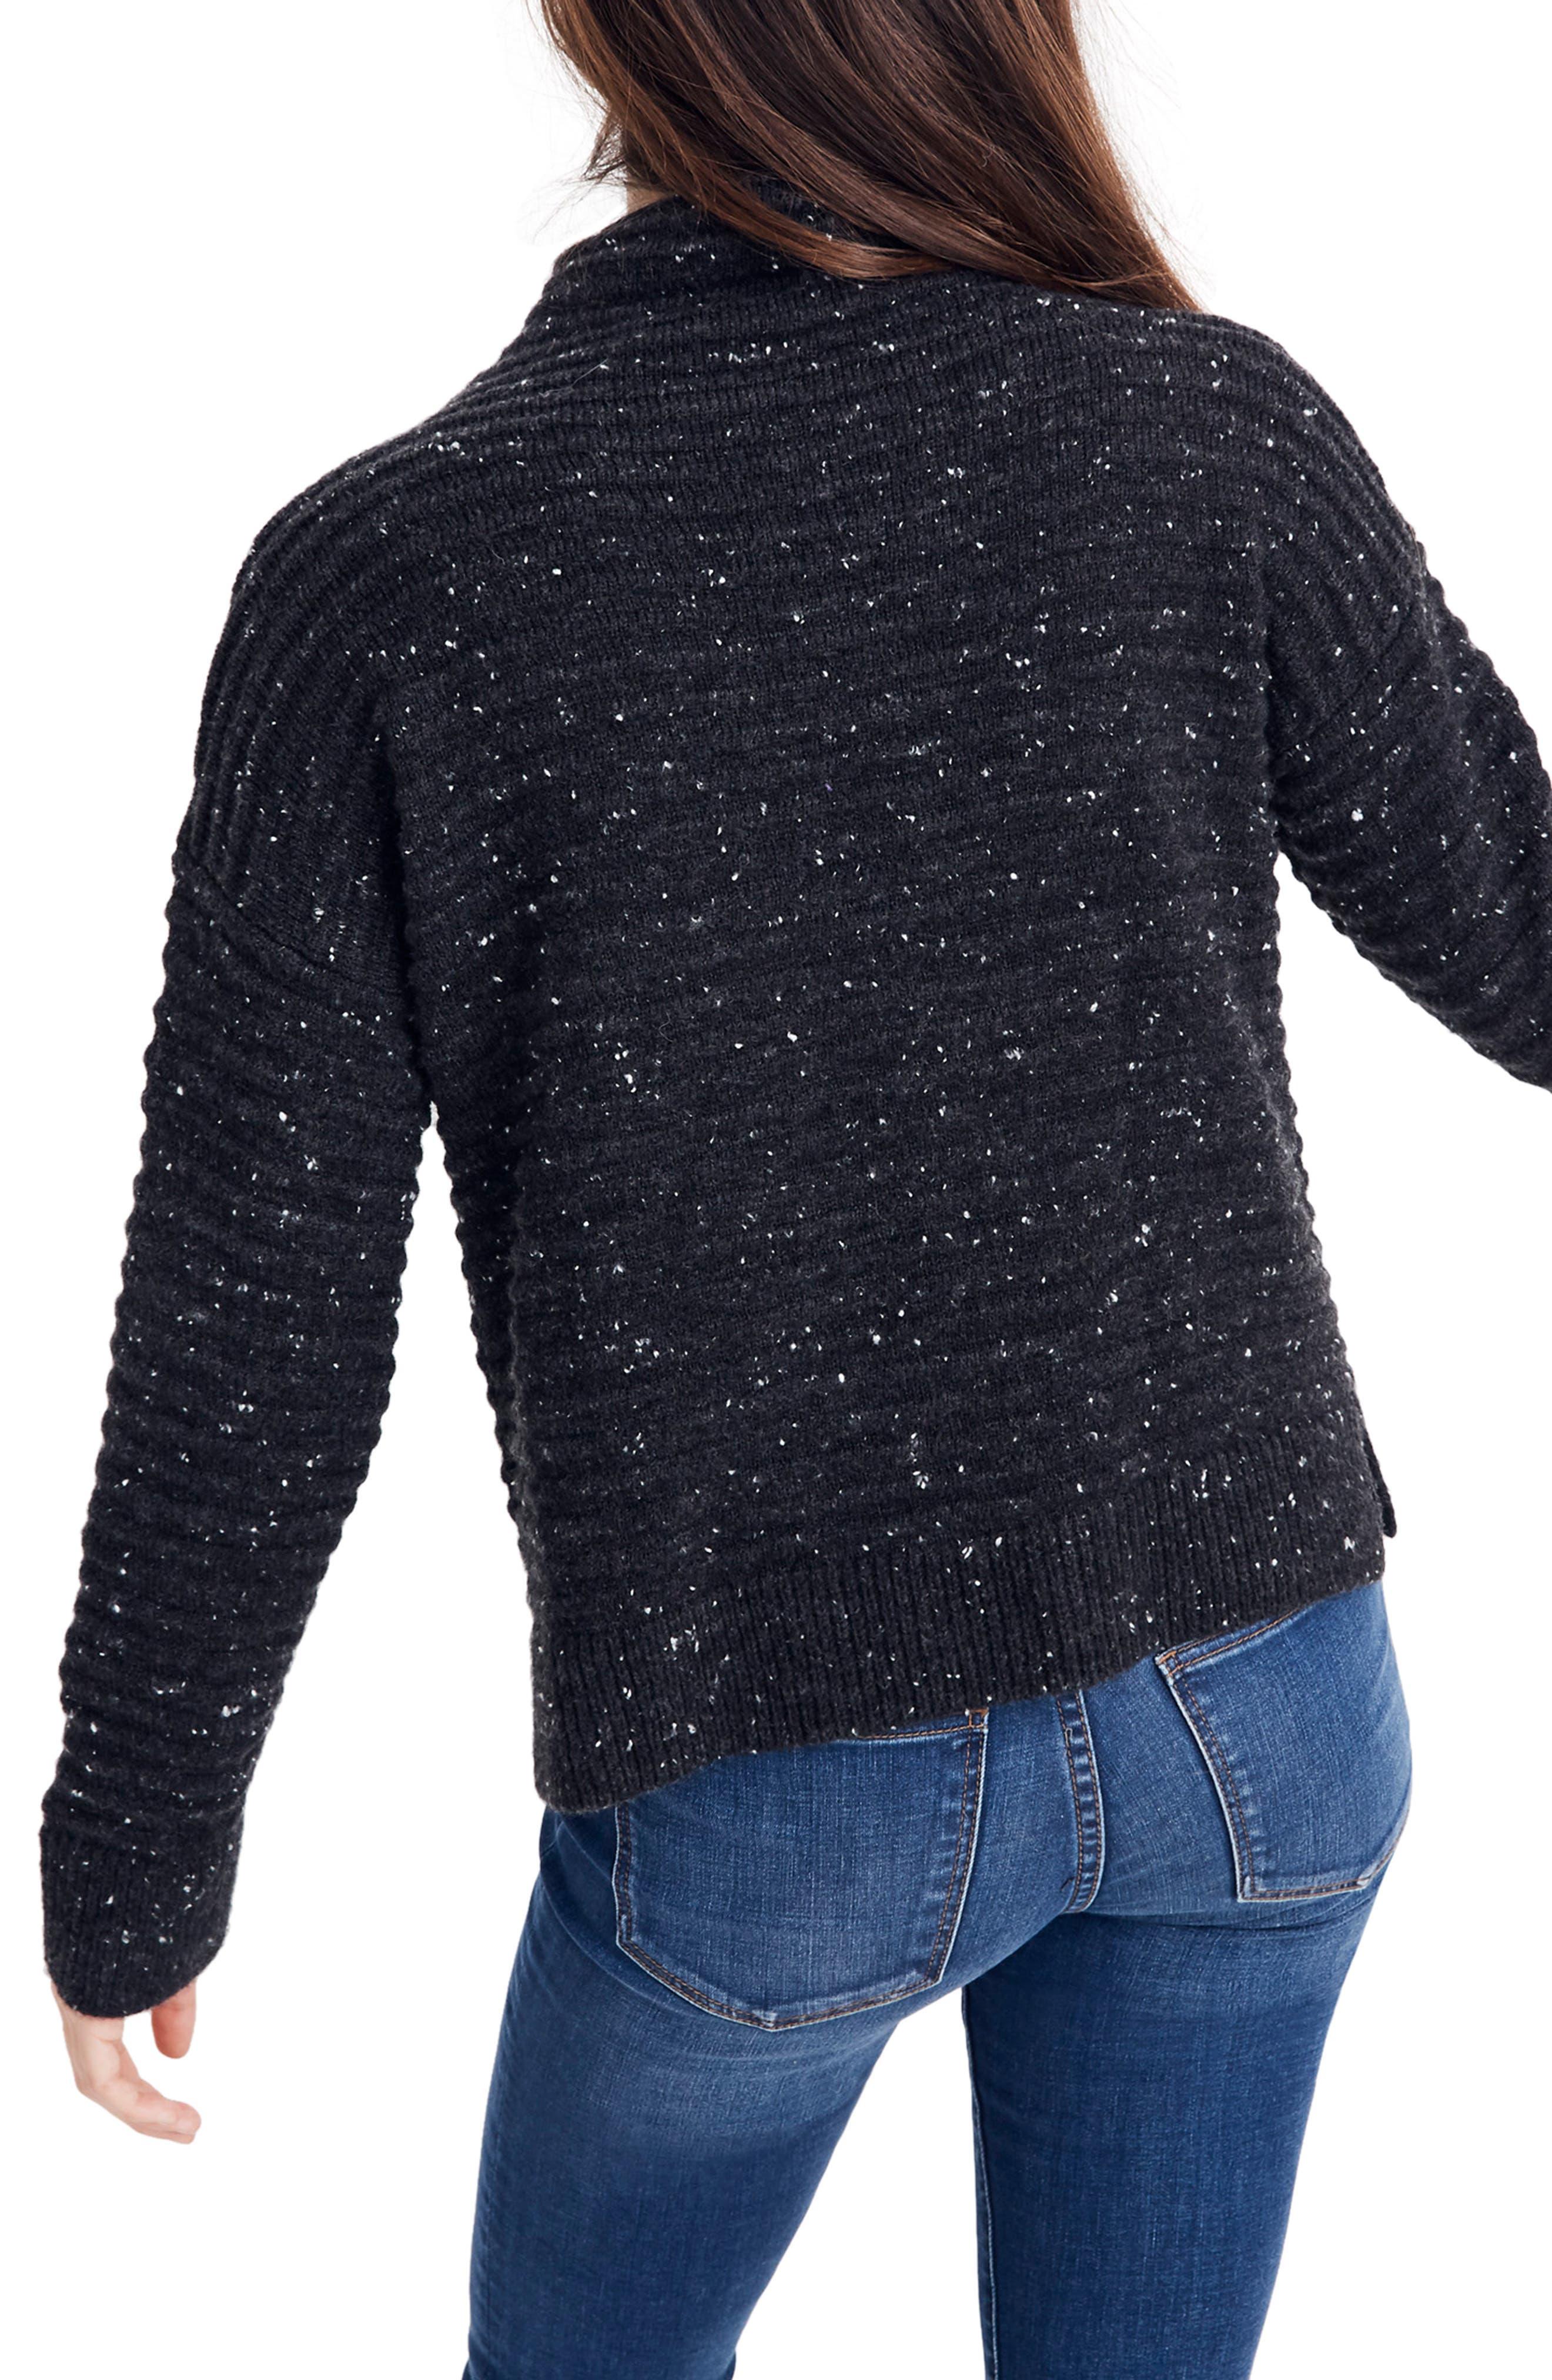 Belmont Donegal Mock Neck Sweater,                             Alternate thumbnail 3, color,                             DONEGAL STORM